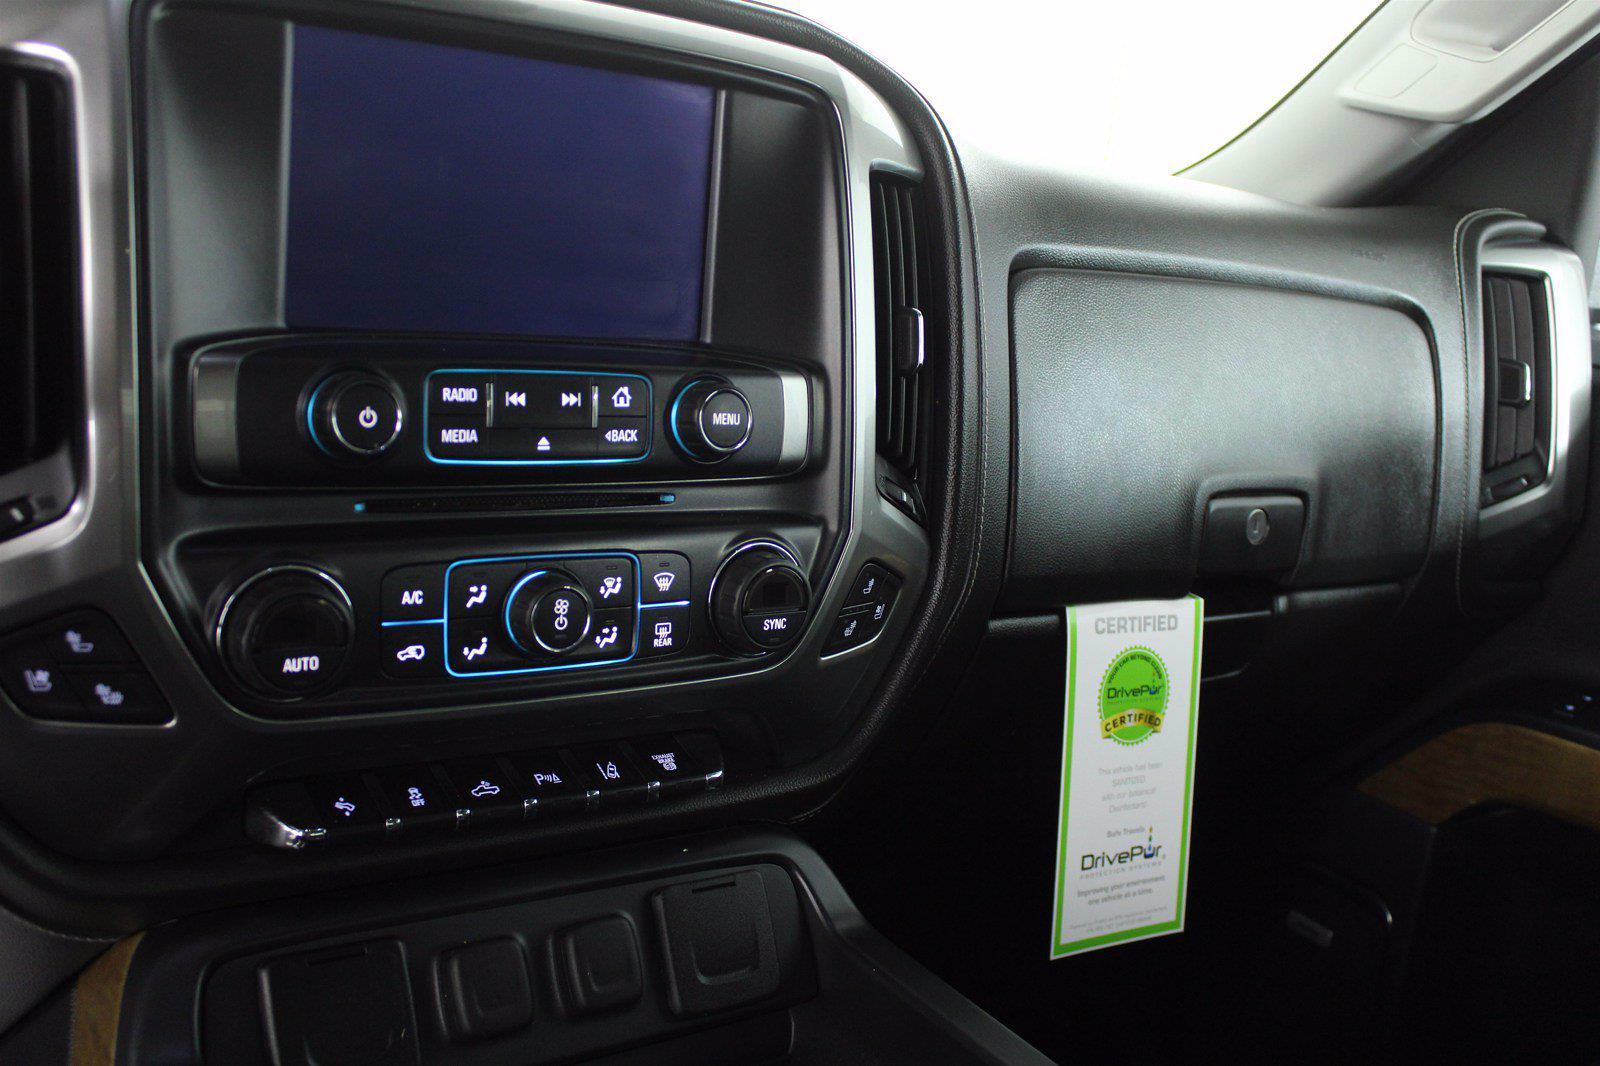 2016 Chevrolet Silverado 2500 Crew Cab 4x2, Pickup #D110630A - photo 5